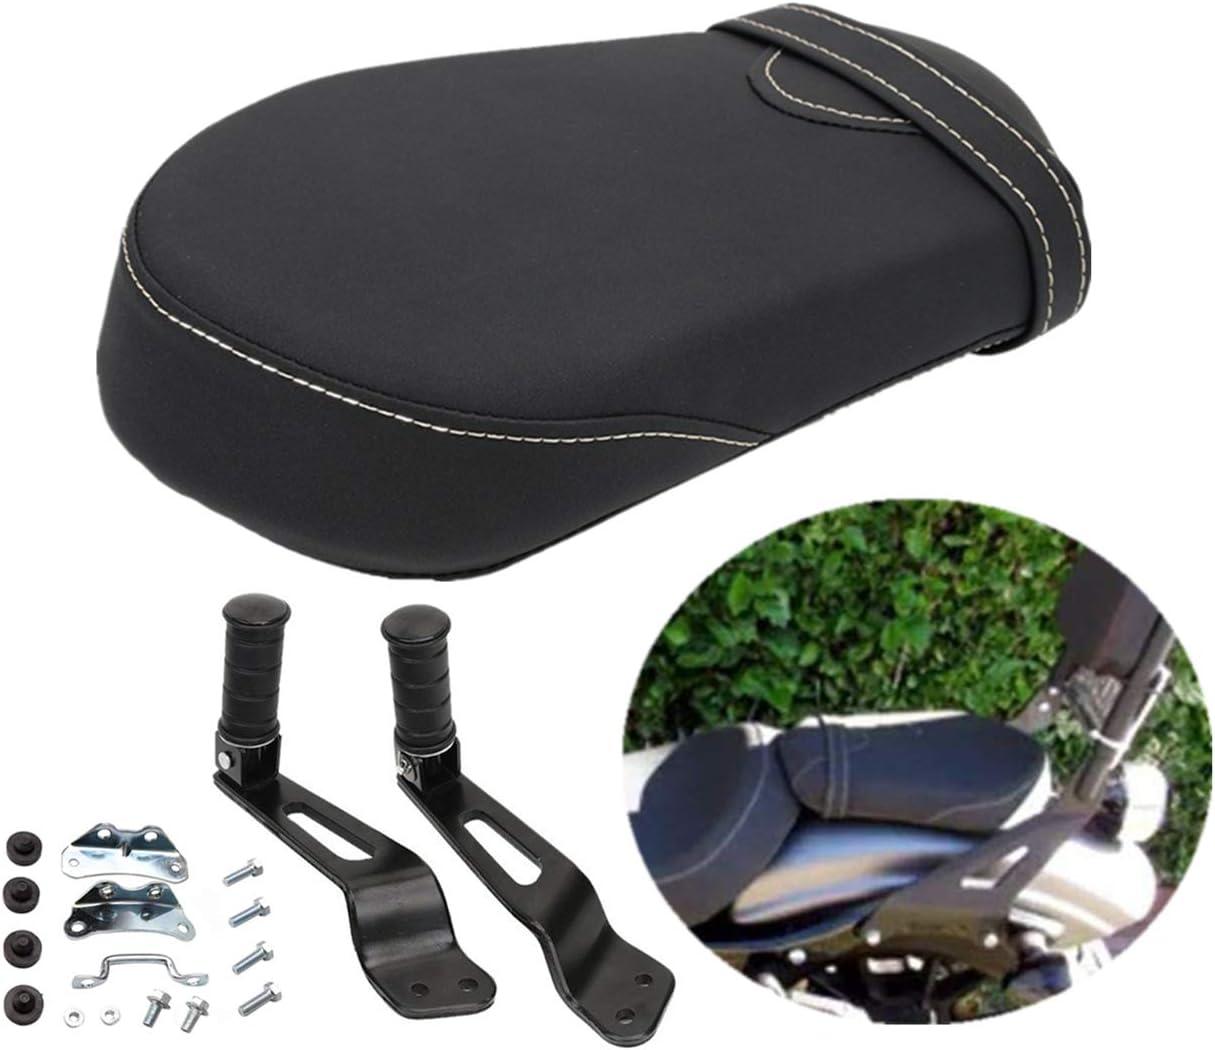 Seat Rear Passenger Foot Pegs Bracket Detachable for Yamaha Bolt XVS950 R-Spec 2014-2018 1TP-F47E0-T0-00